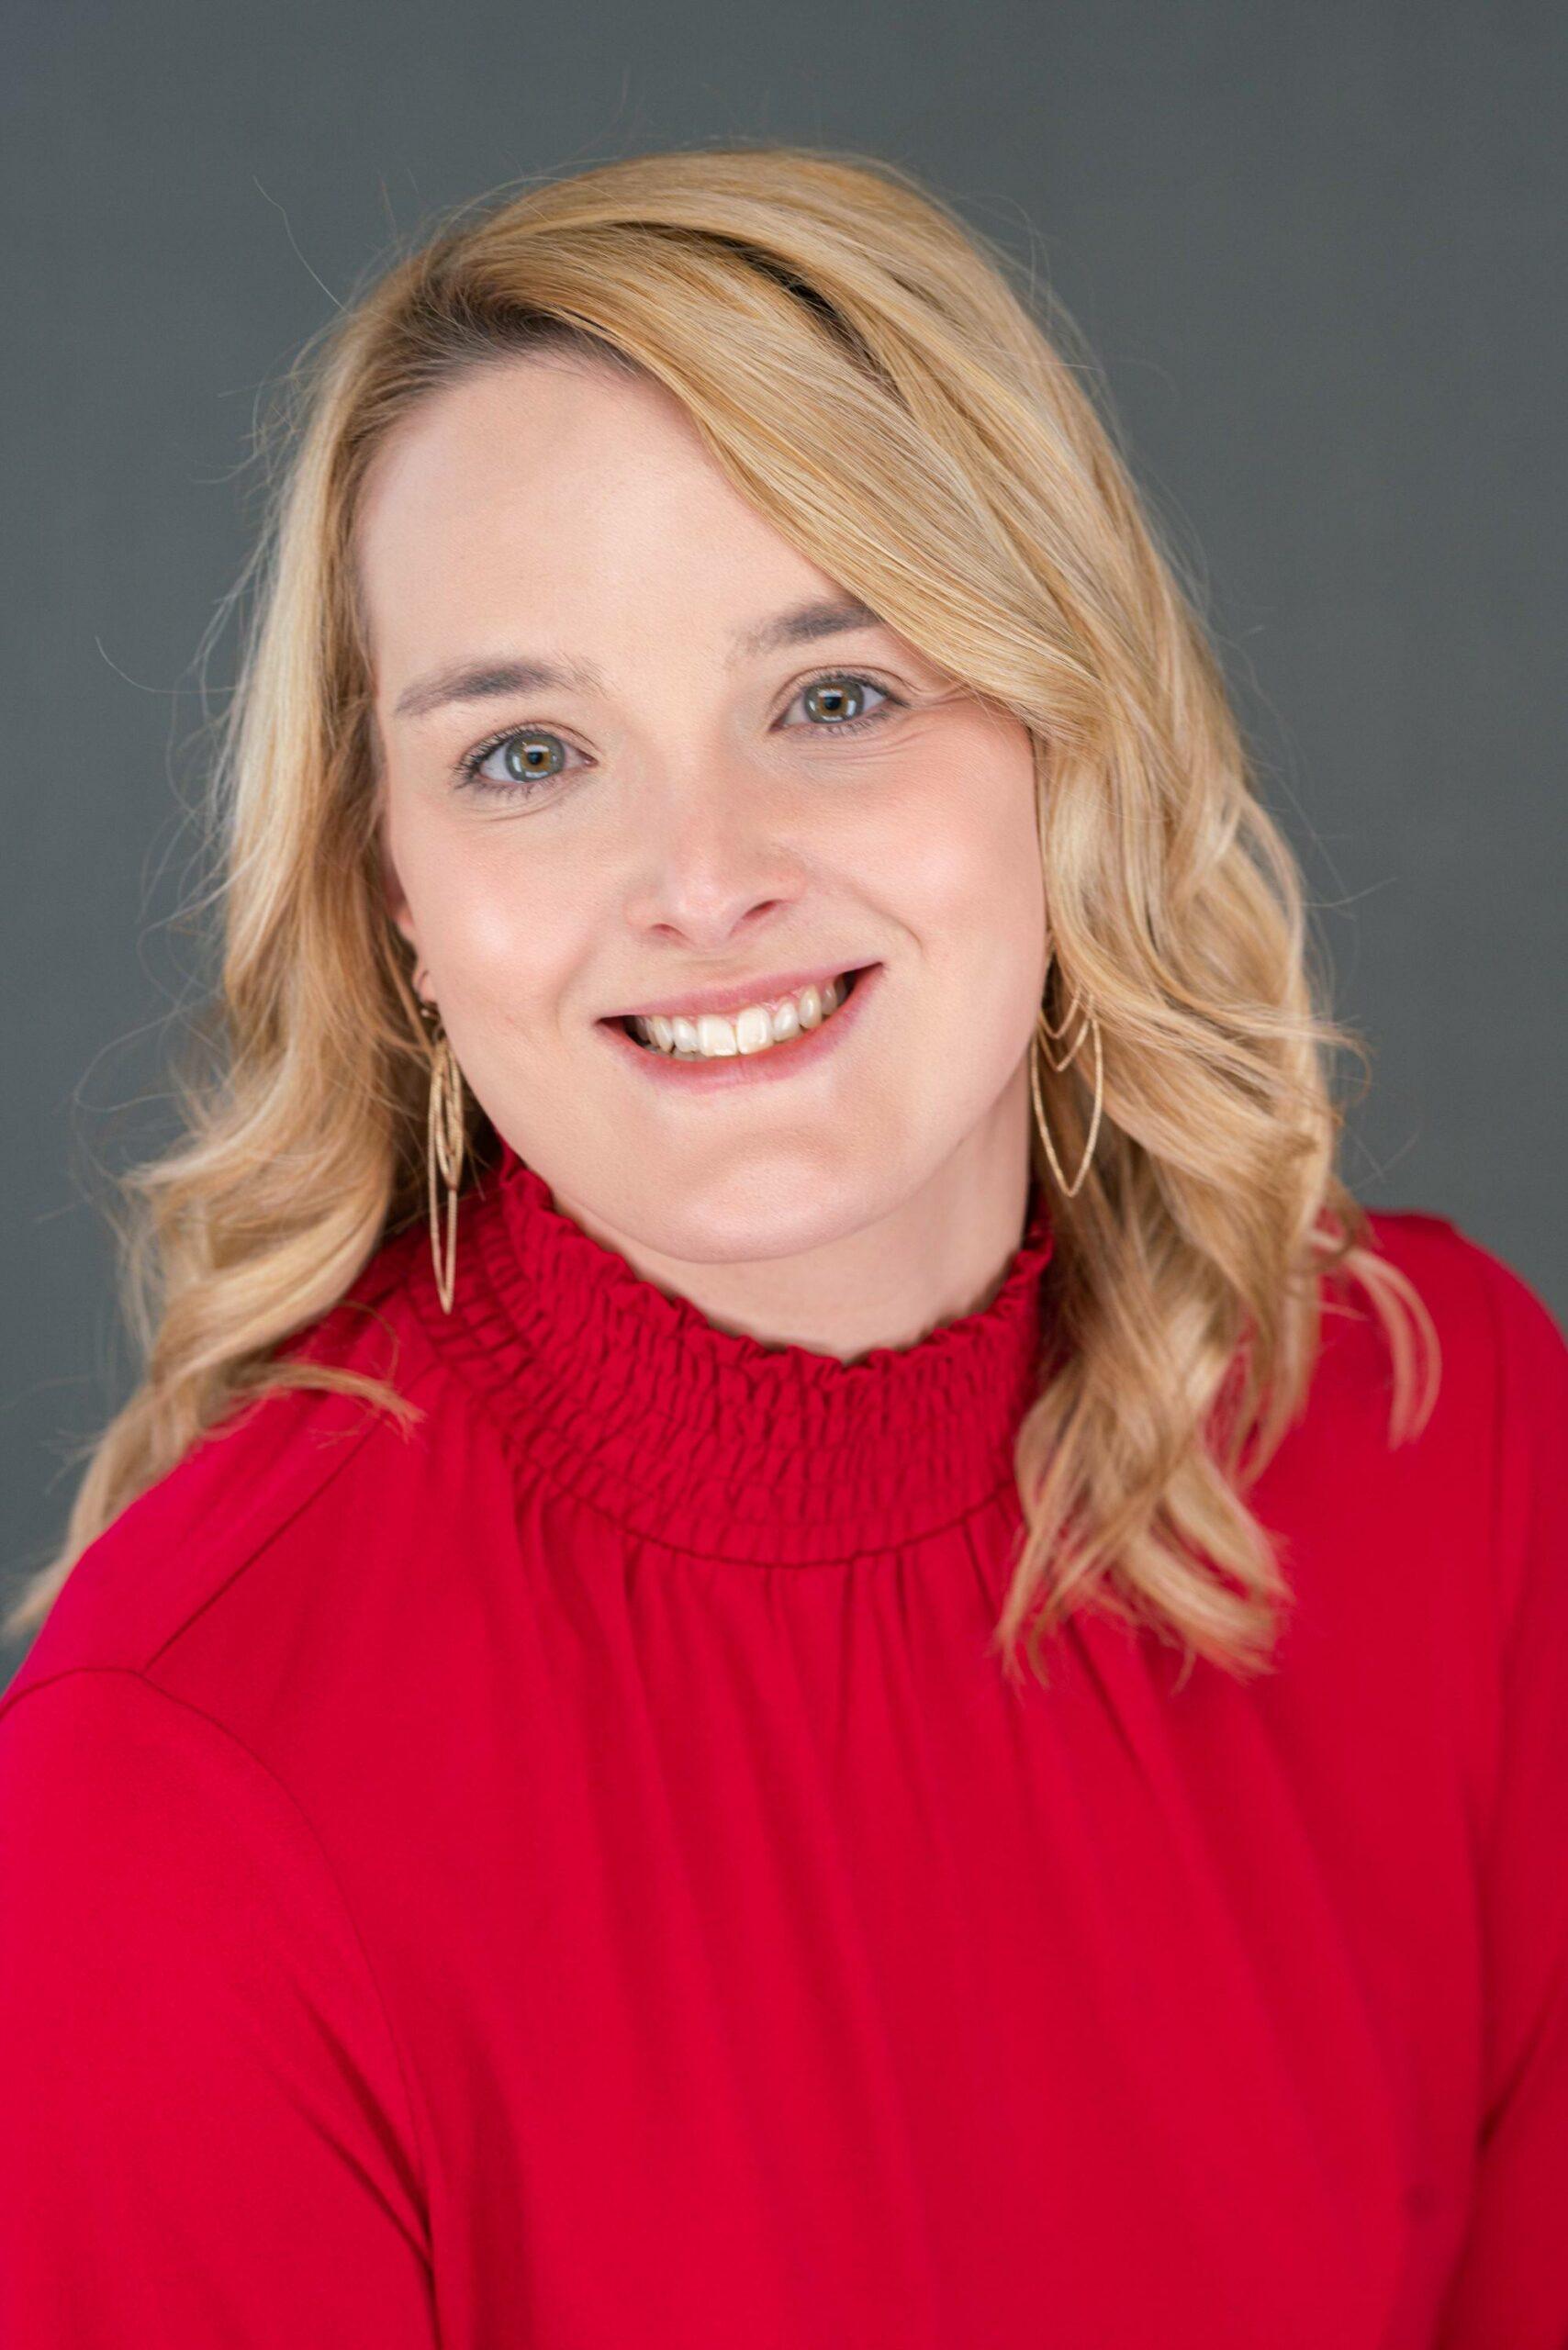 JESSICA MONAHAN Development Director